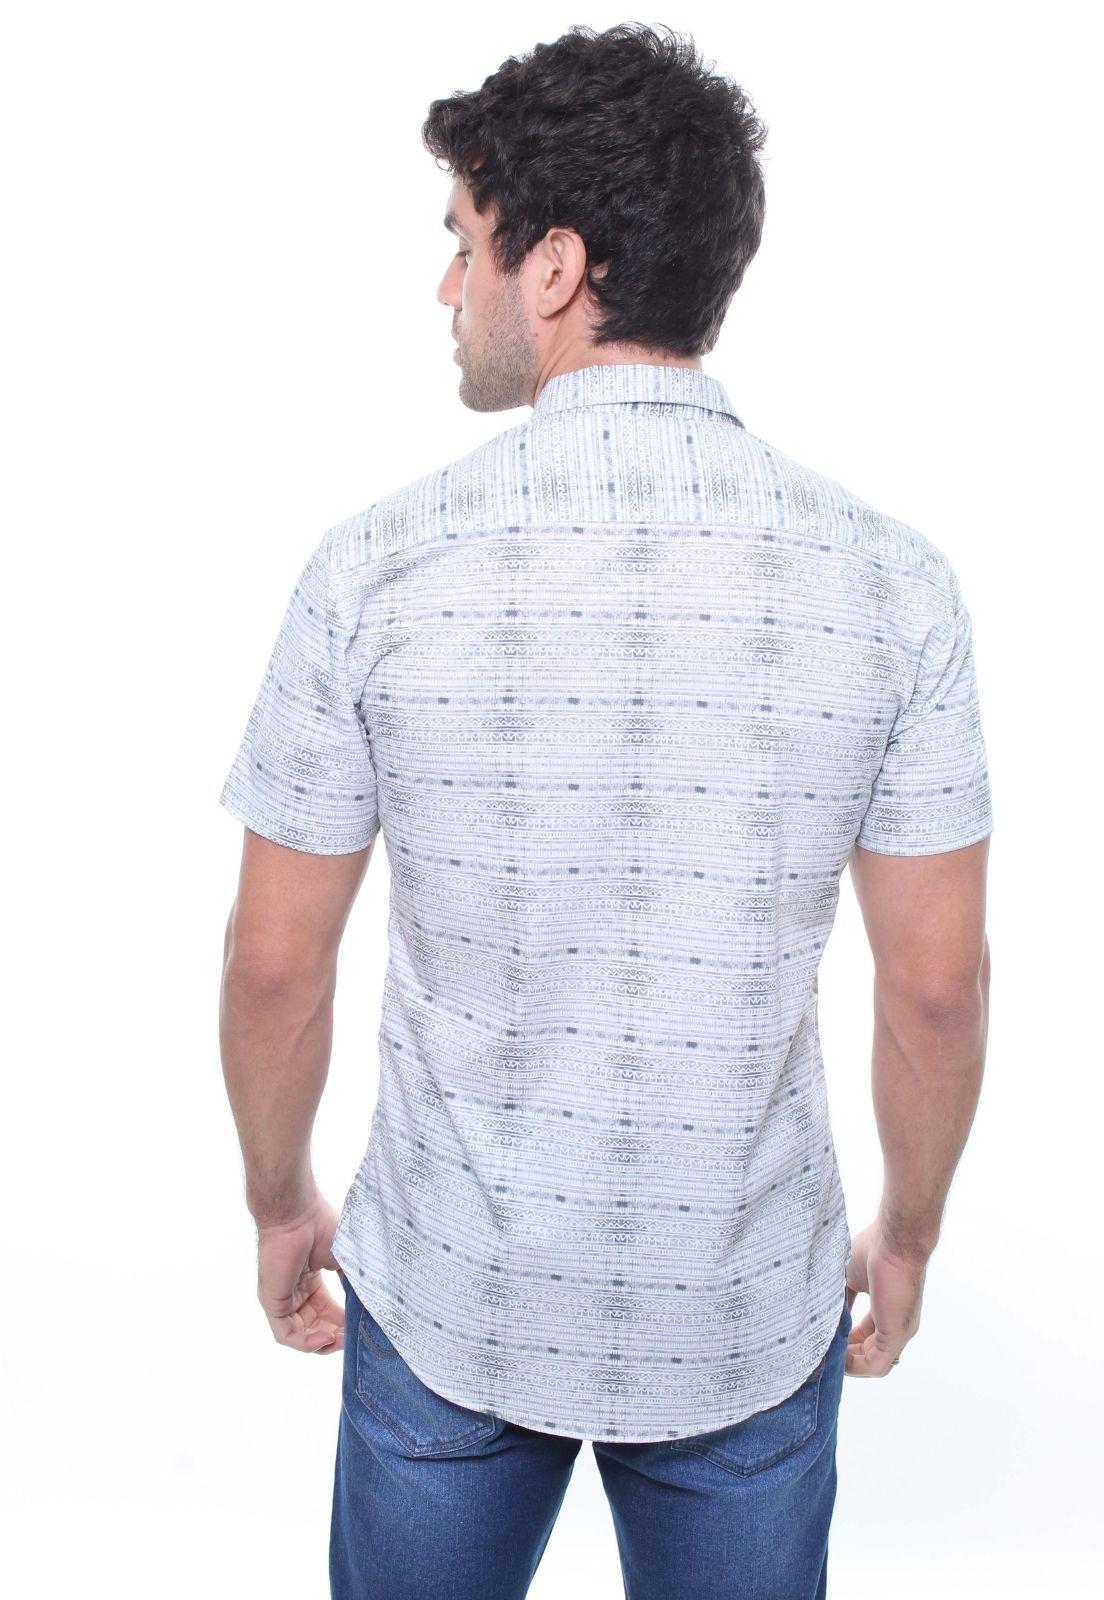 Camisa Estampada Masculina Manga Curta Crocker - 47826  - CROCKER JEANS